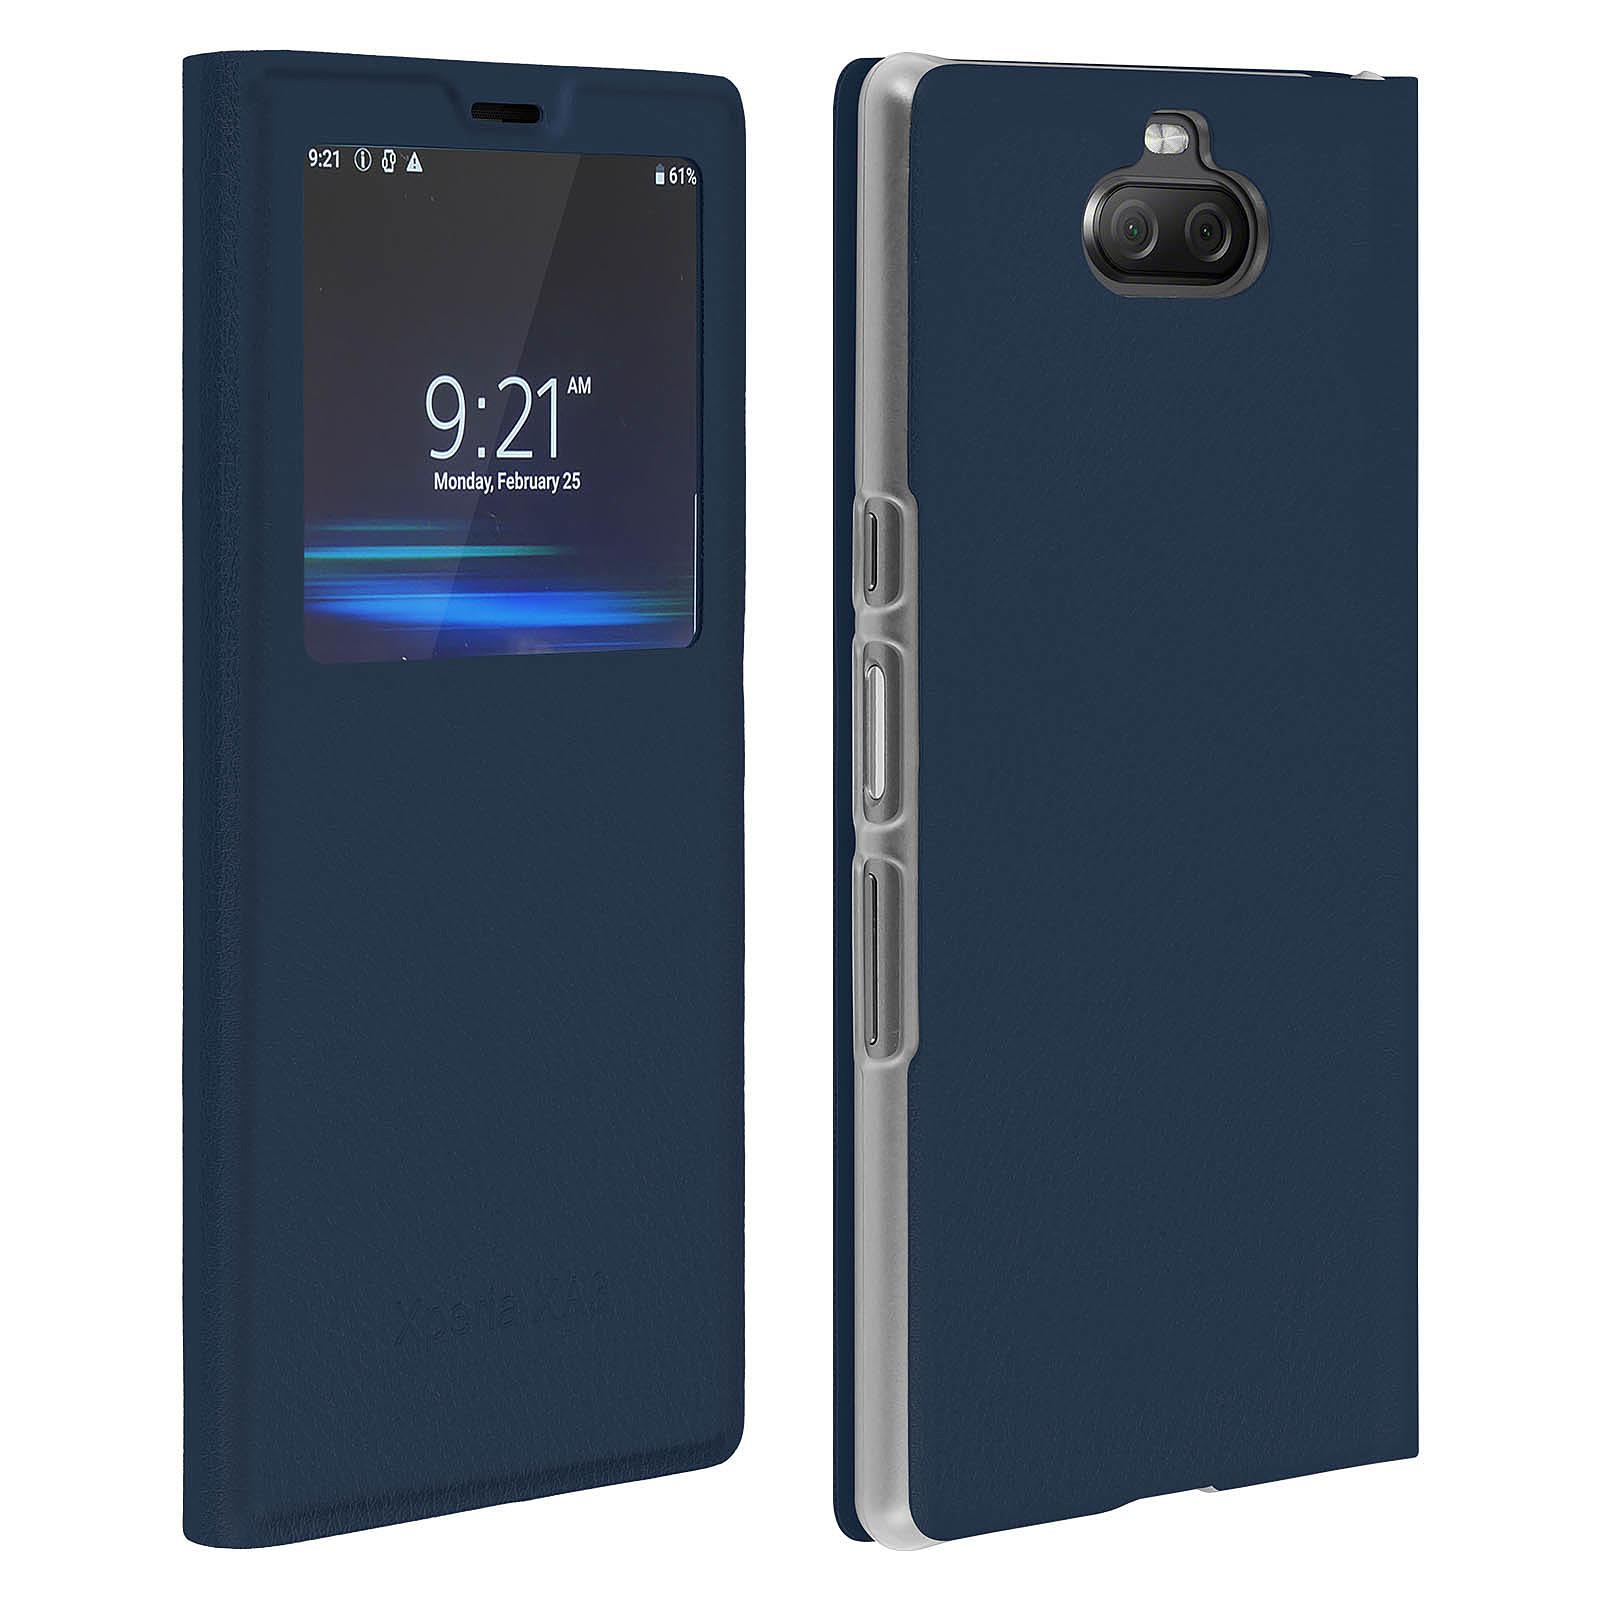 Avizar Etui folio Bleu Nuit pour Sony Xperia 10